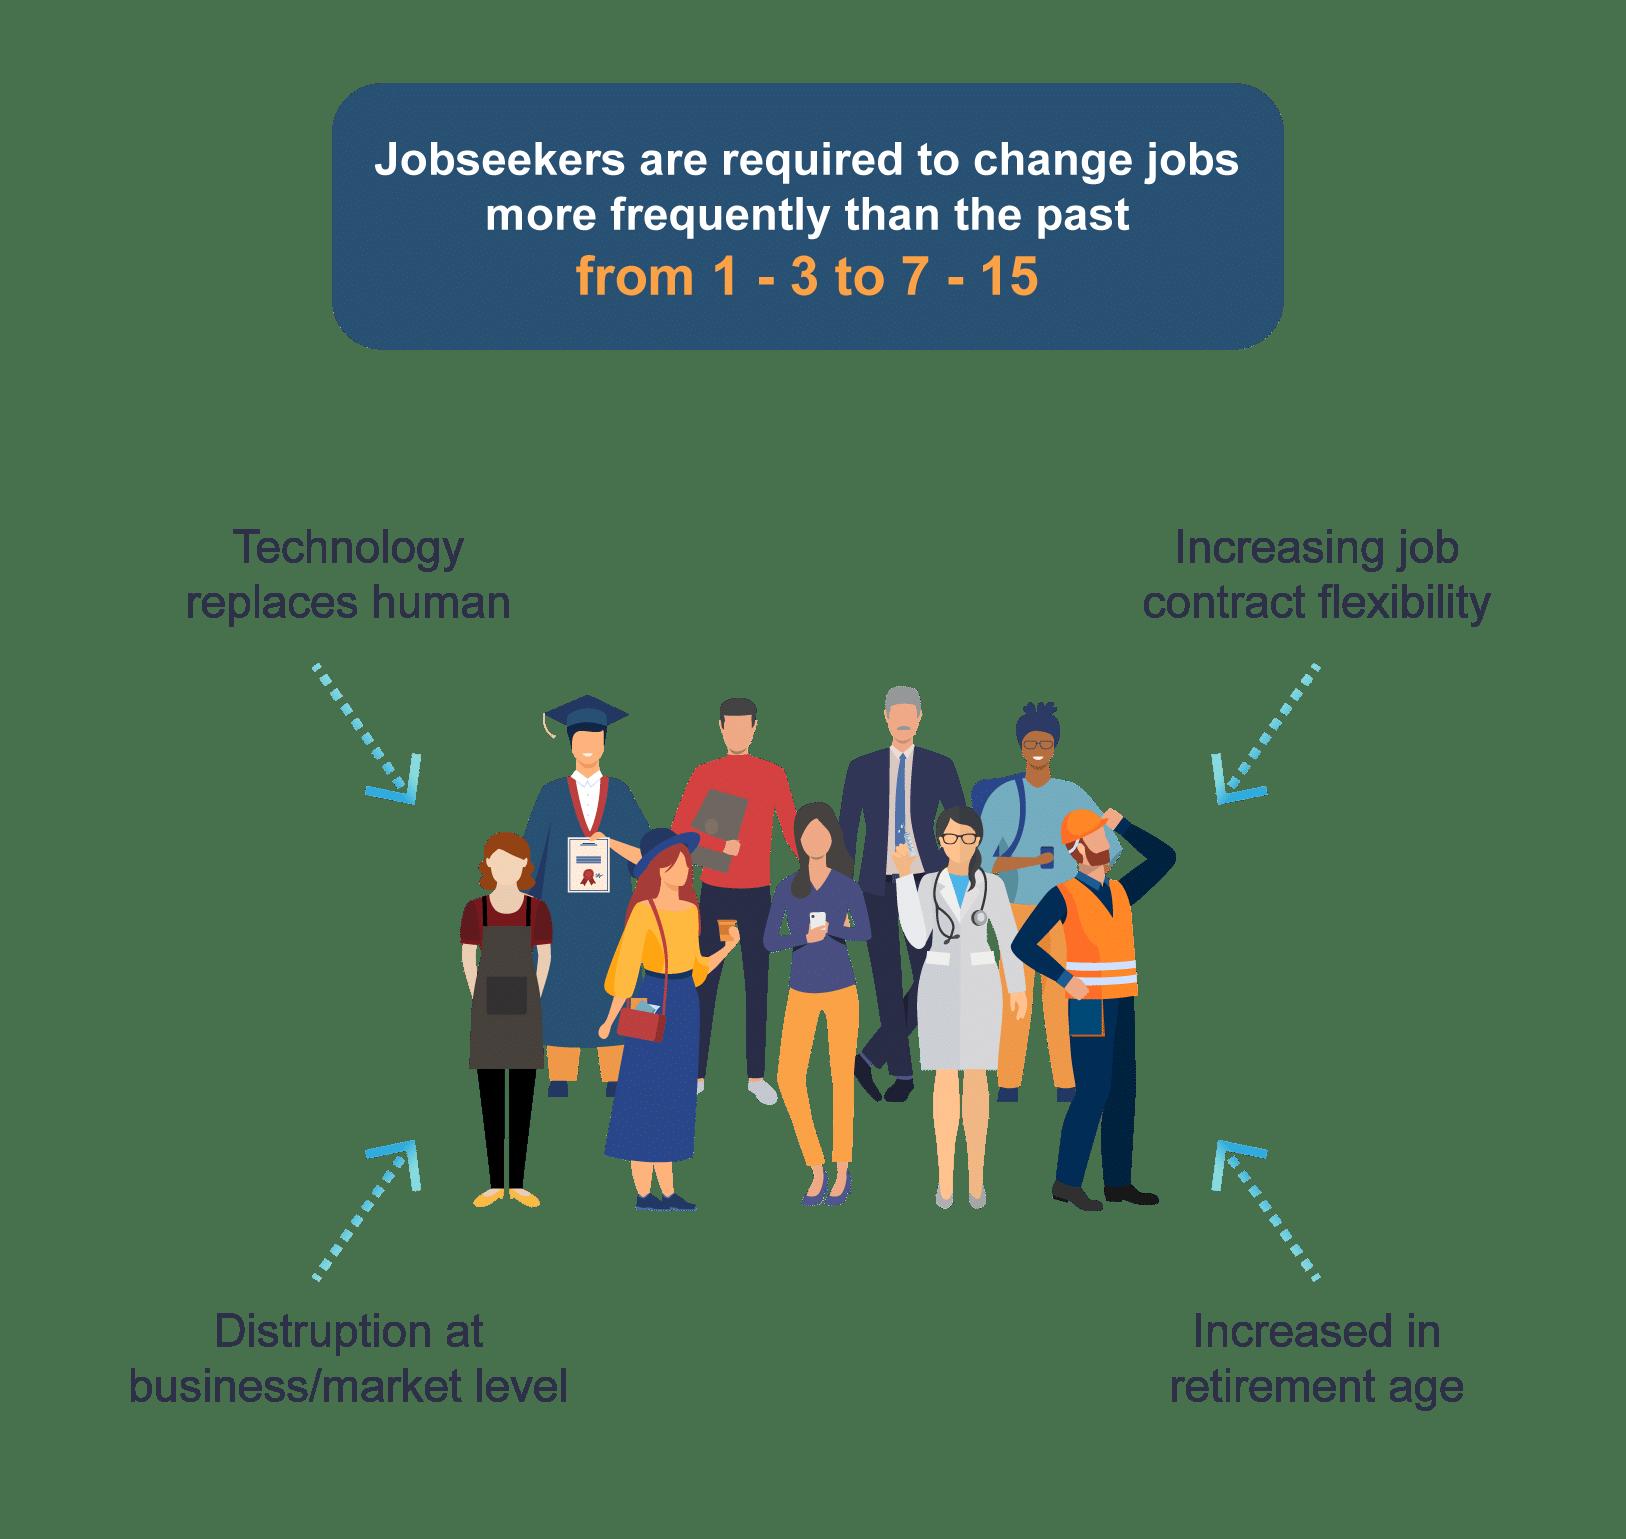 dati sui candidati supportati dal consulente di carriera Jobiri